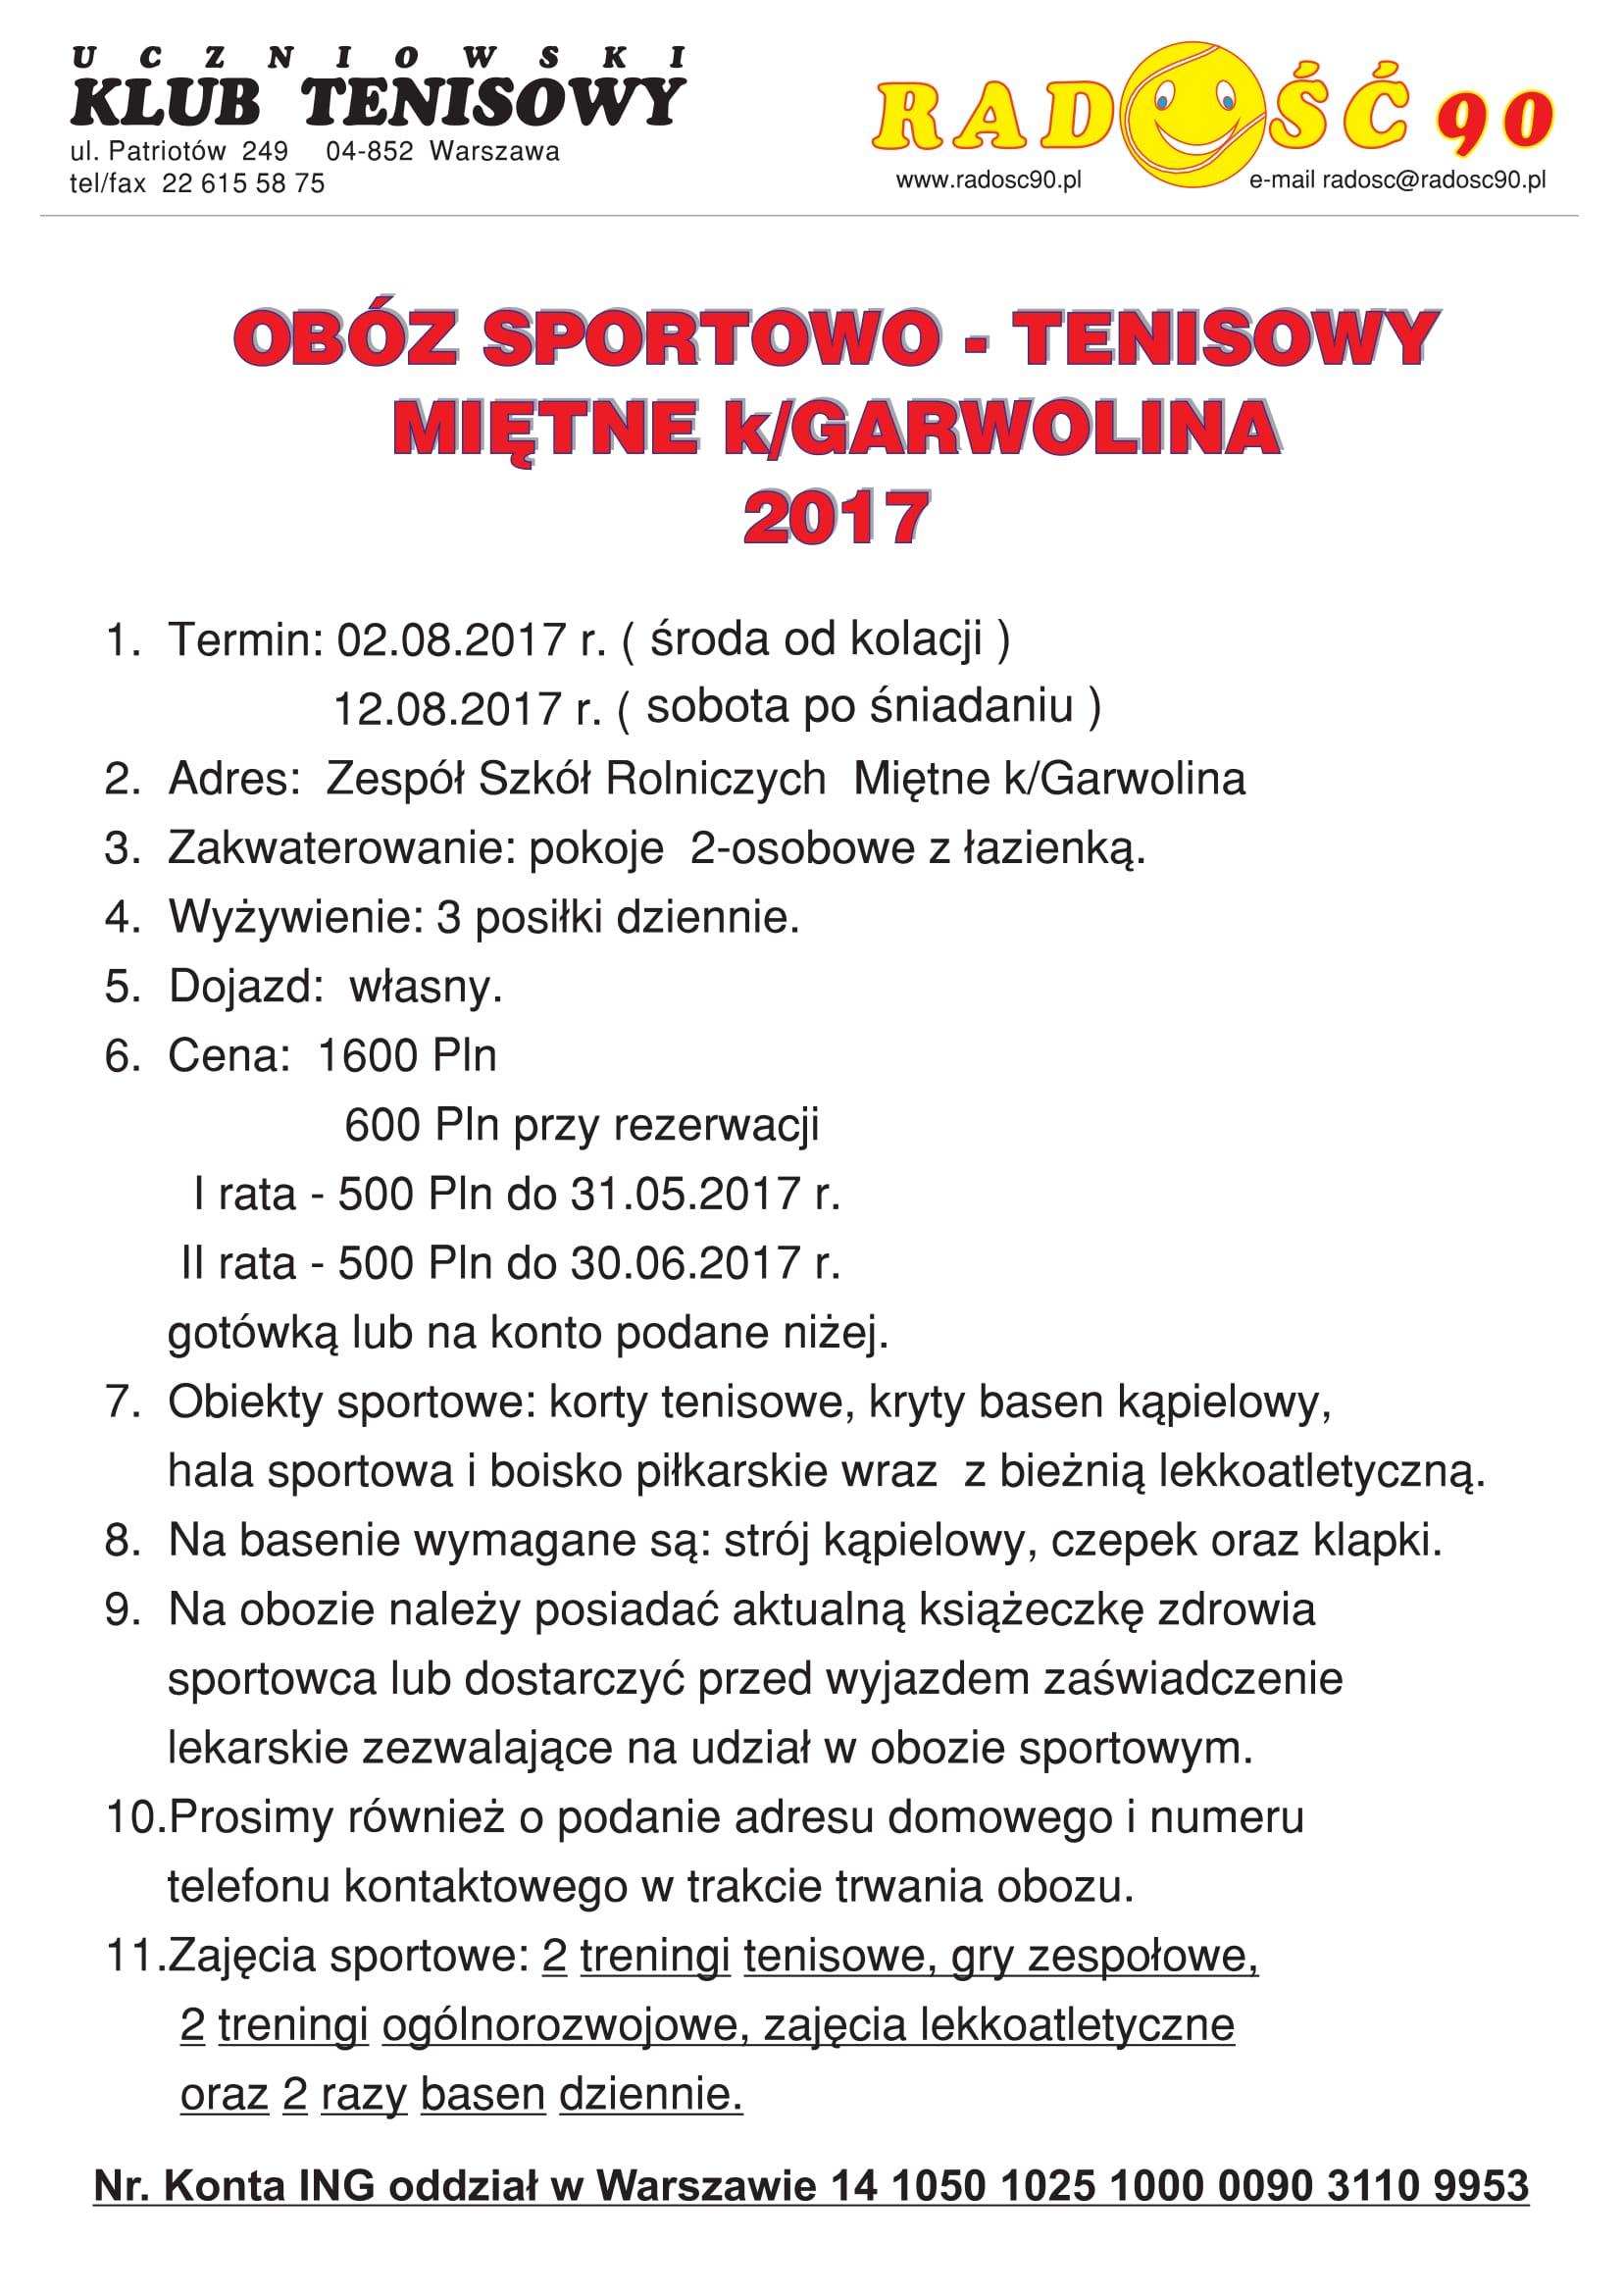 miętne_2017-1